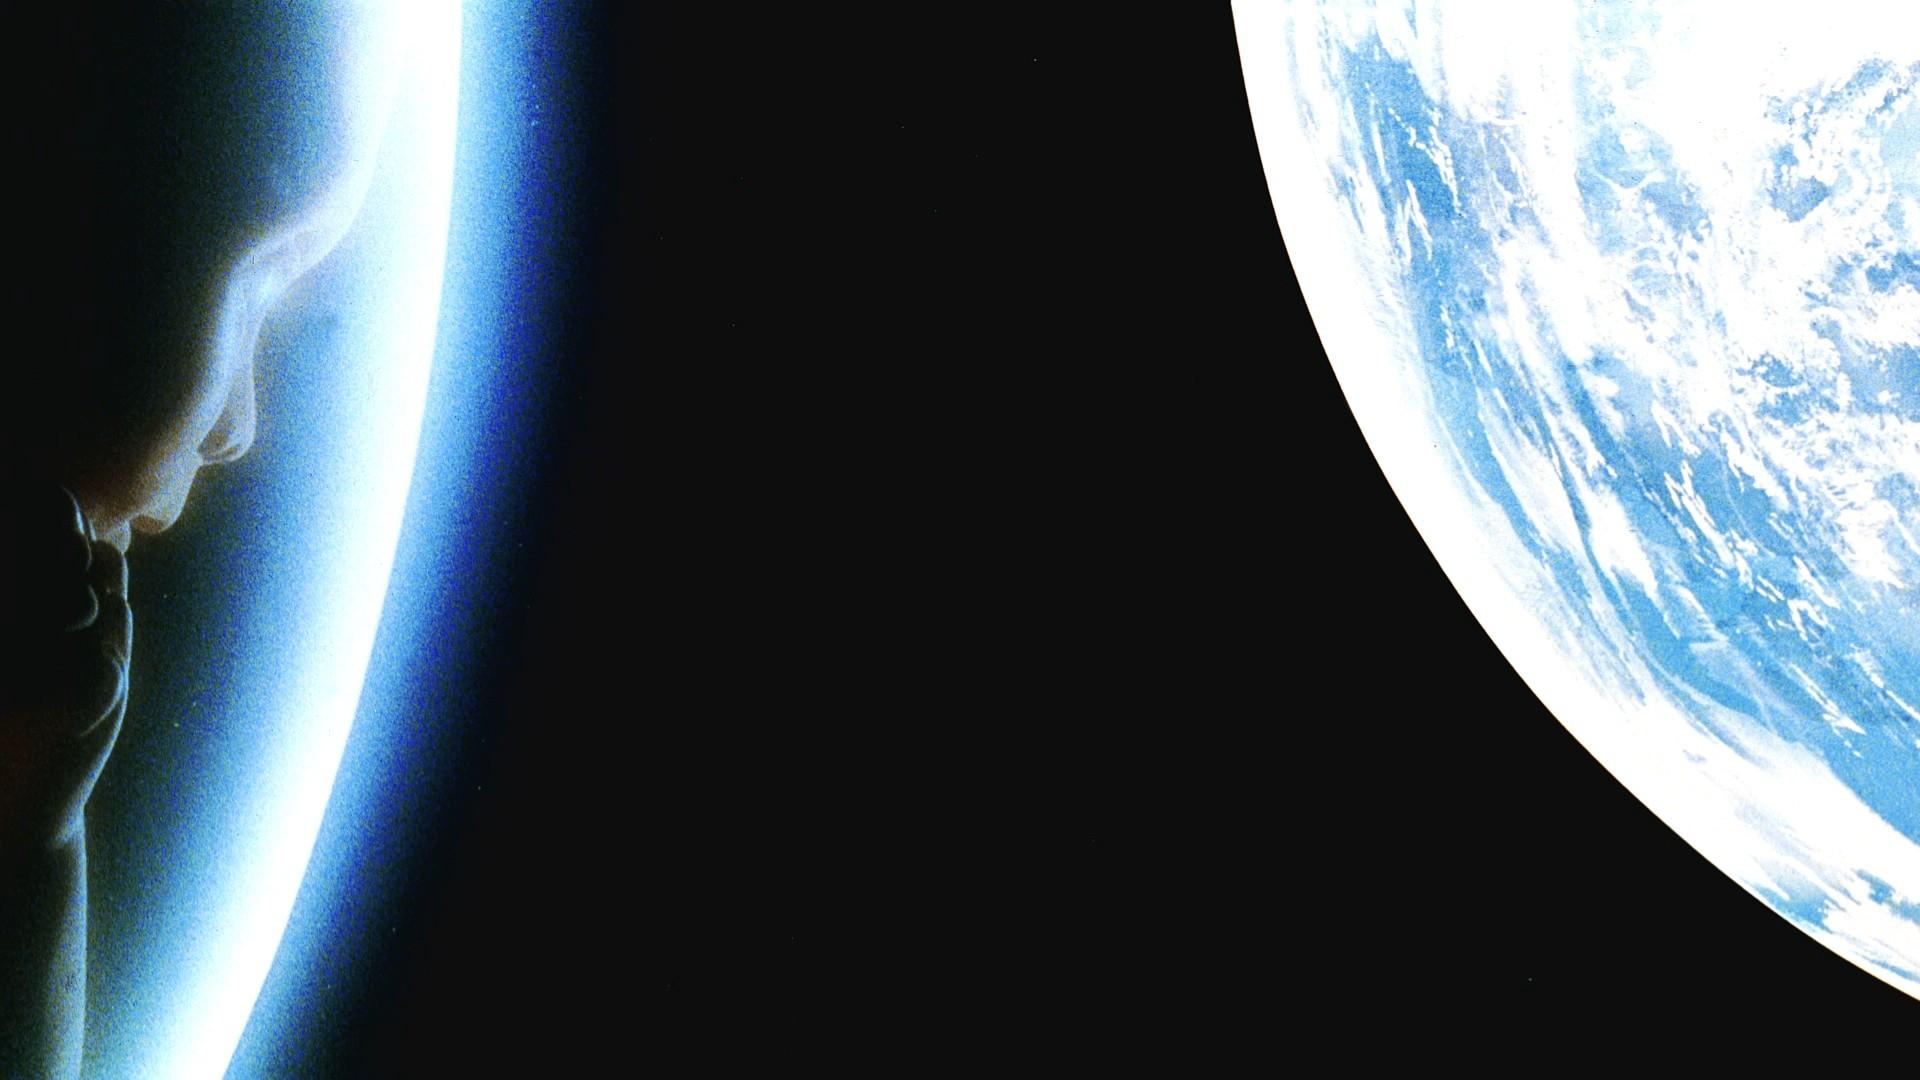 22. 2001: A Space Odyssey (1968)